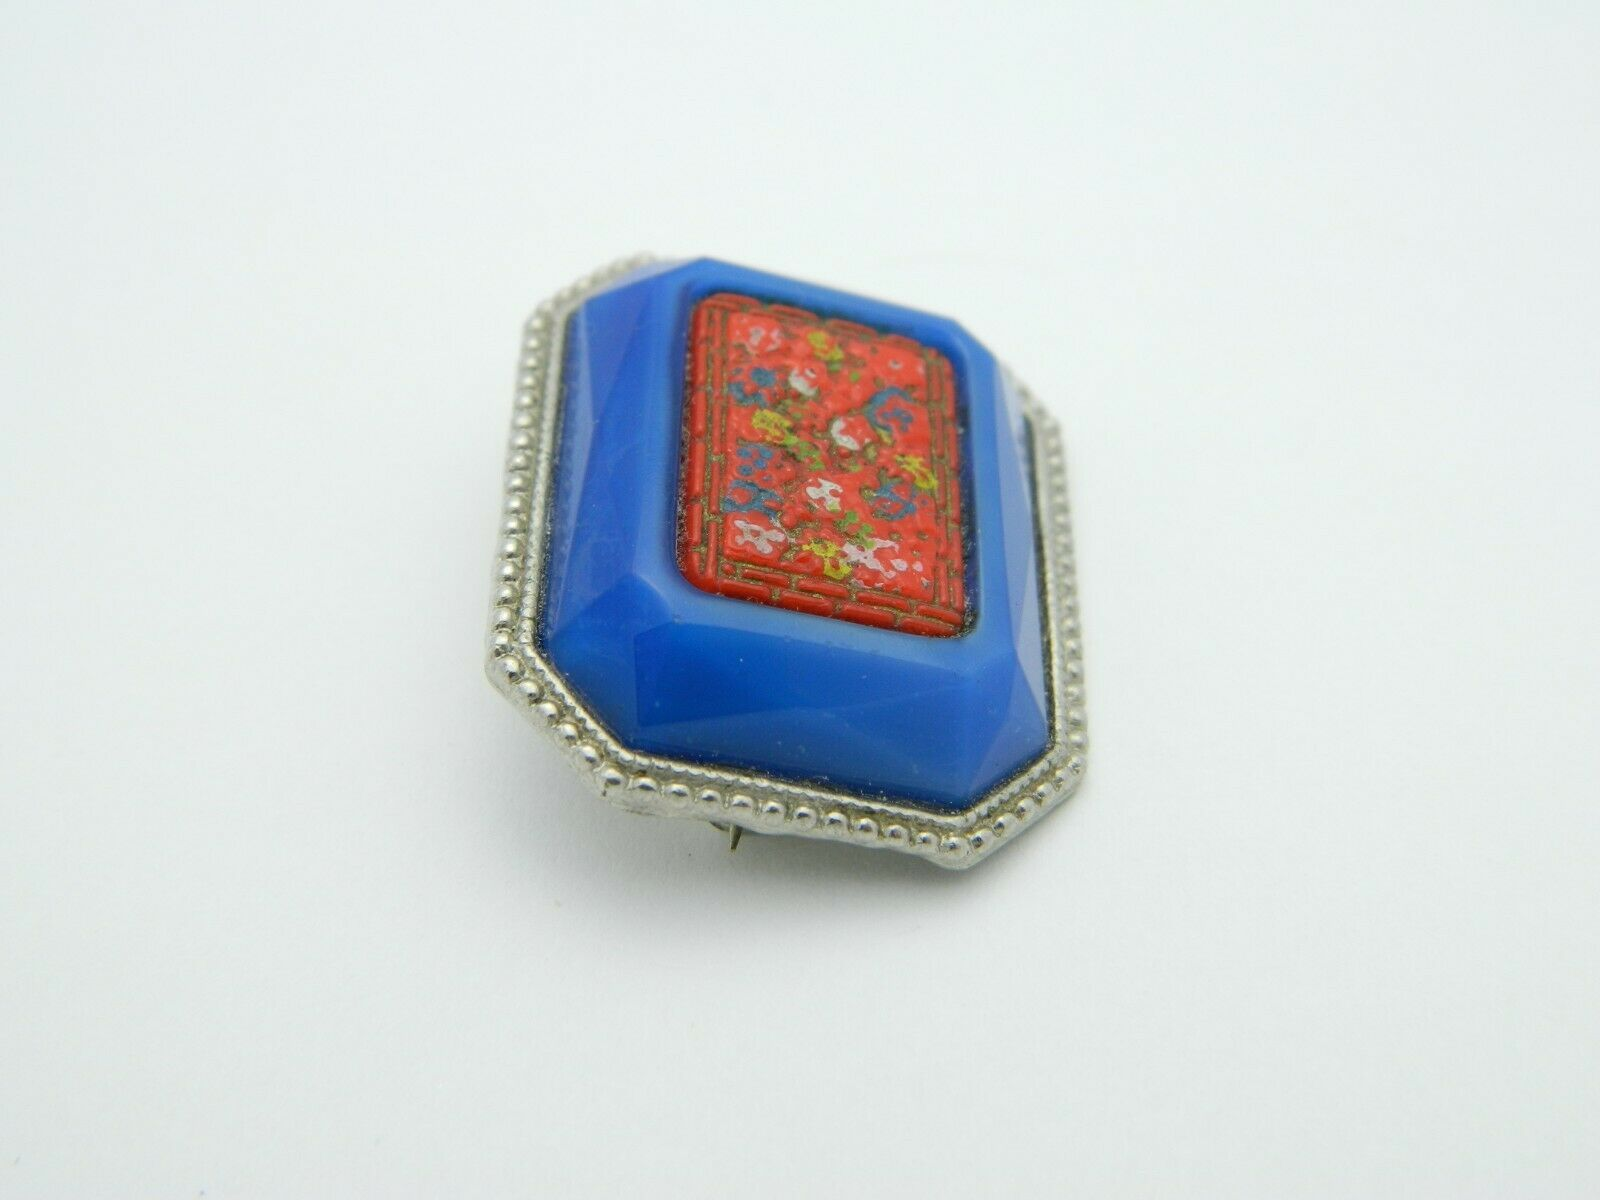 Enamel Inlay Cinnabar Floral Flower Blue Art Glass Silver Tone VTG Pin Brooch